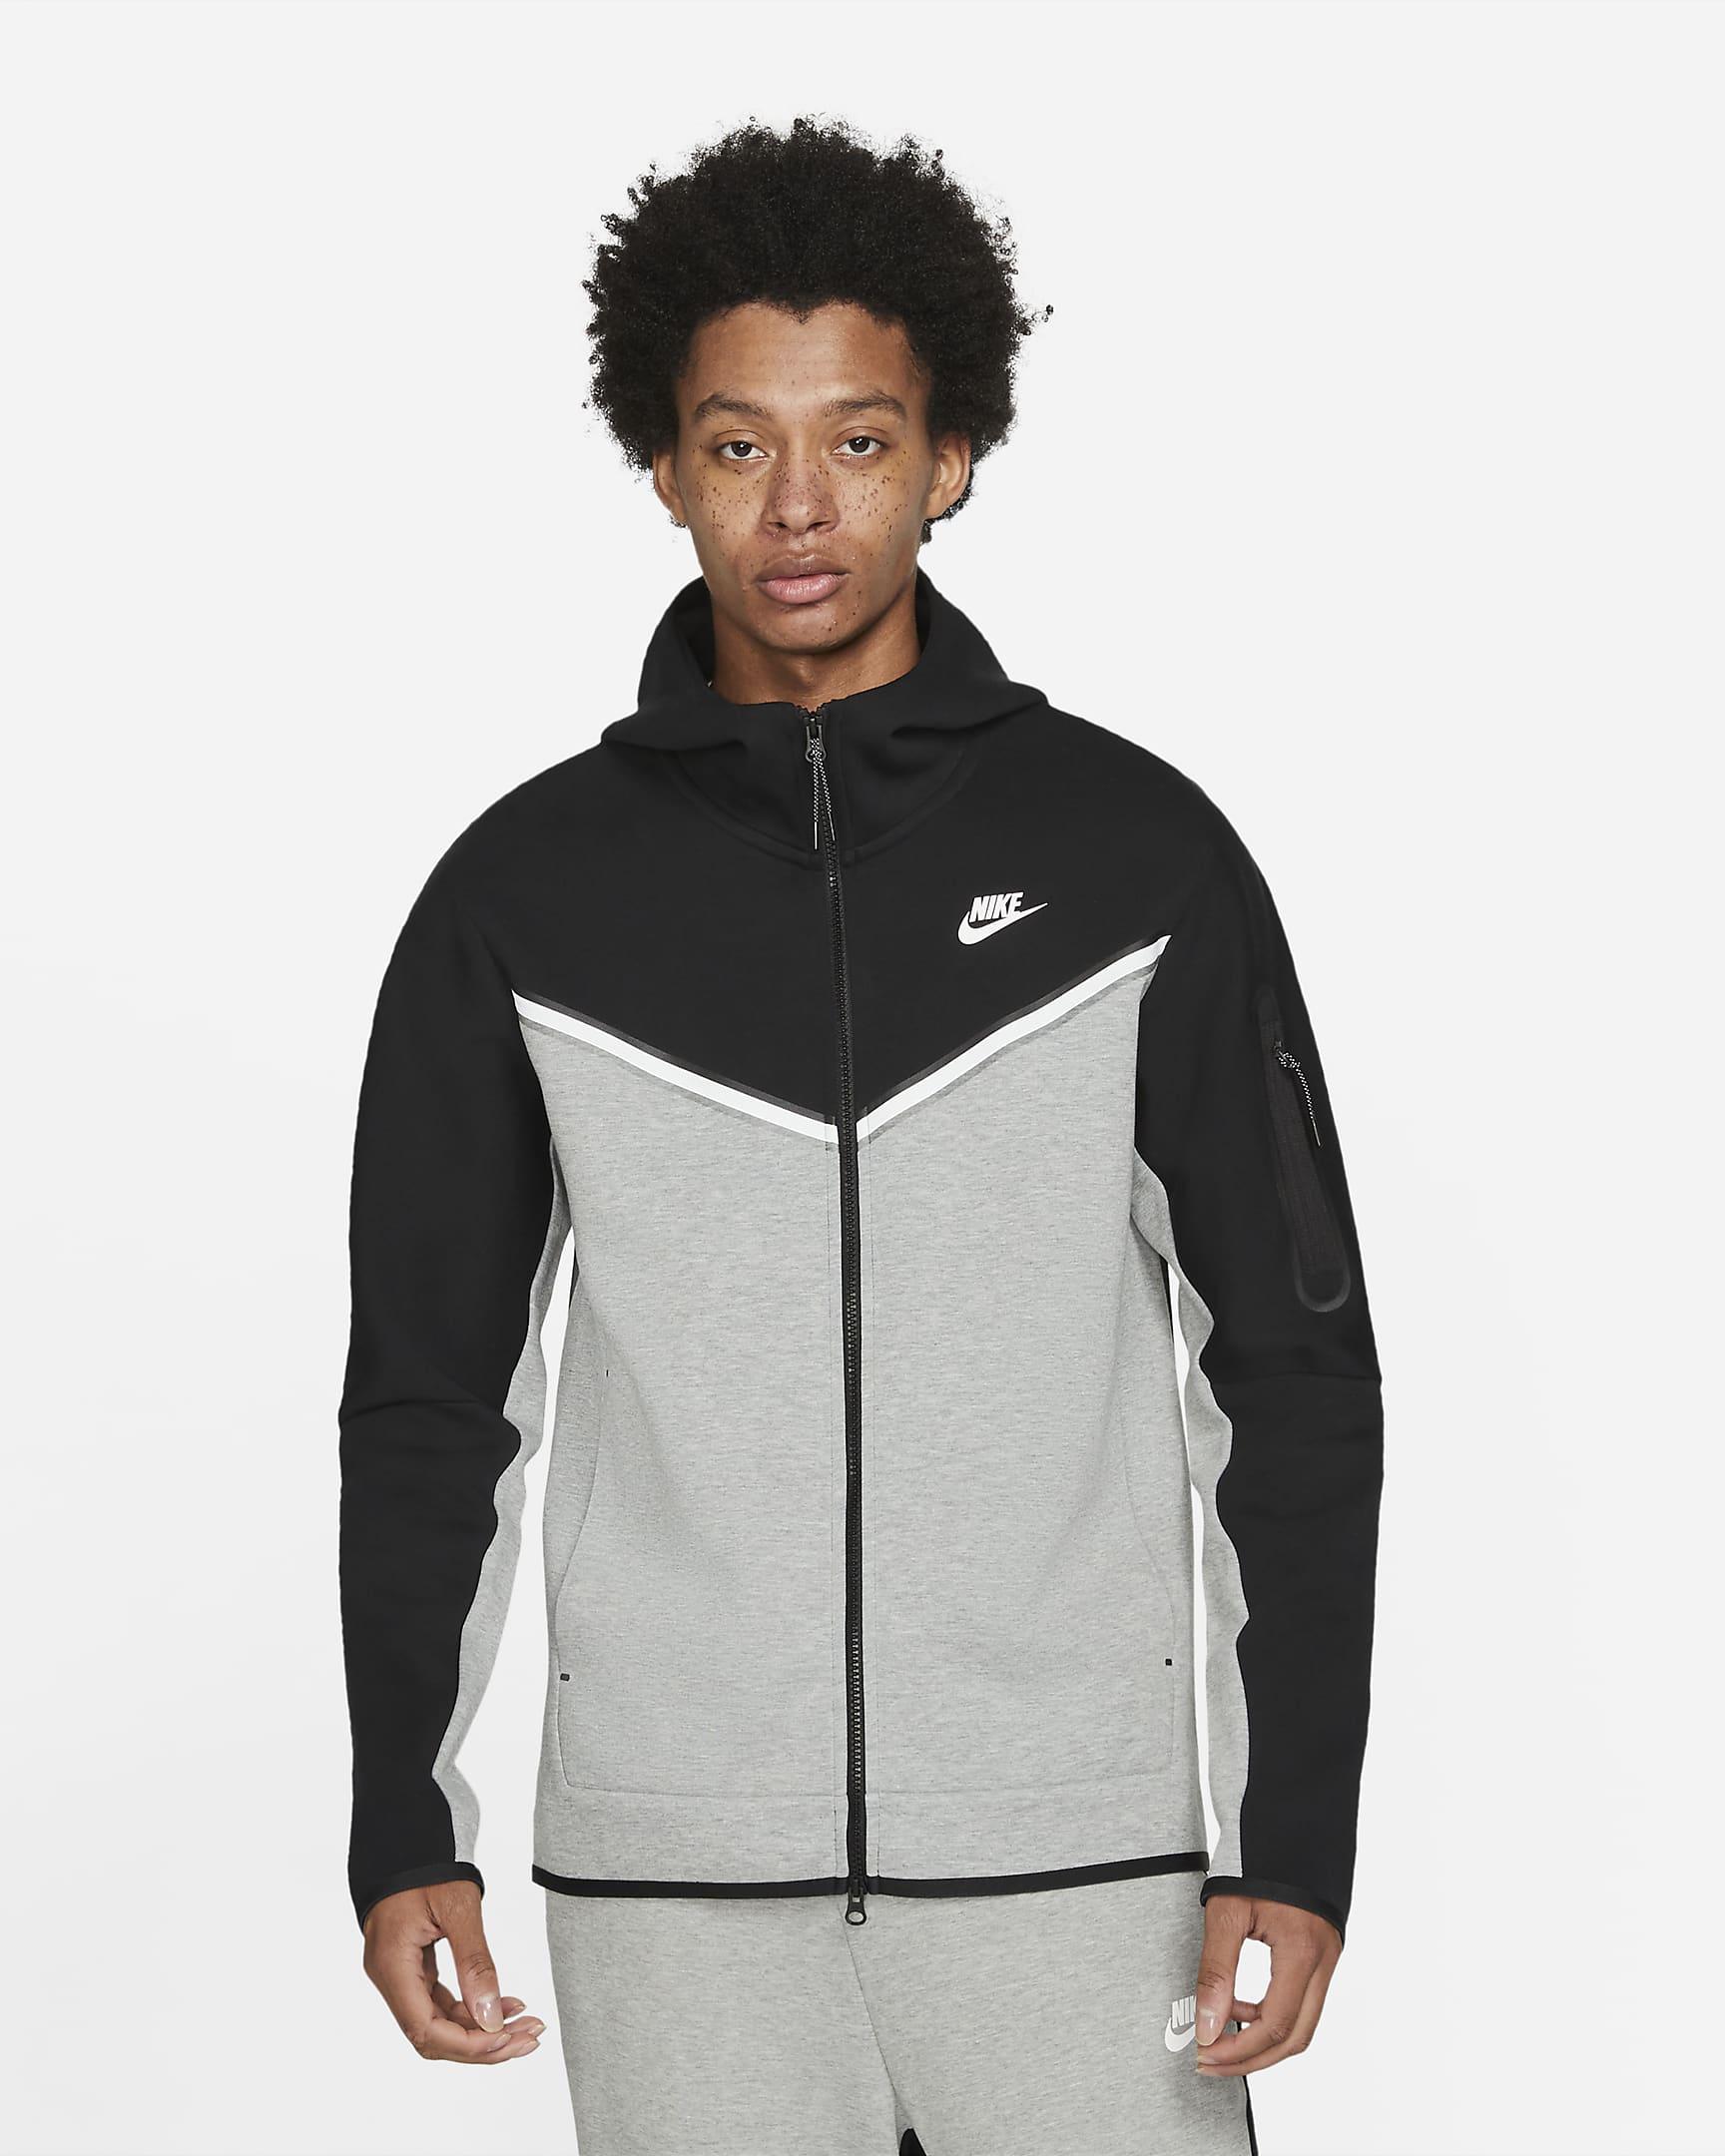 sportswear-tech-fleece-mens-full-zip-hoodie-5ZtTtk.png